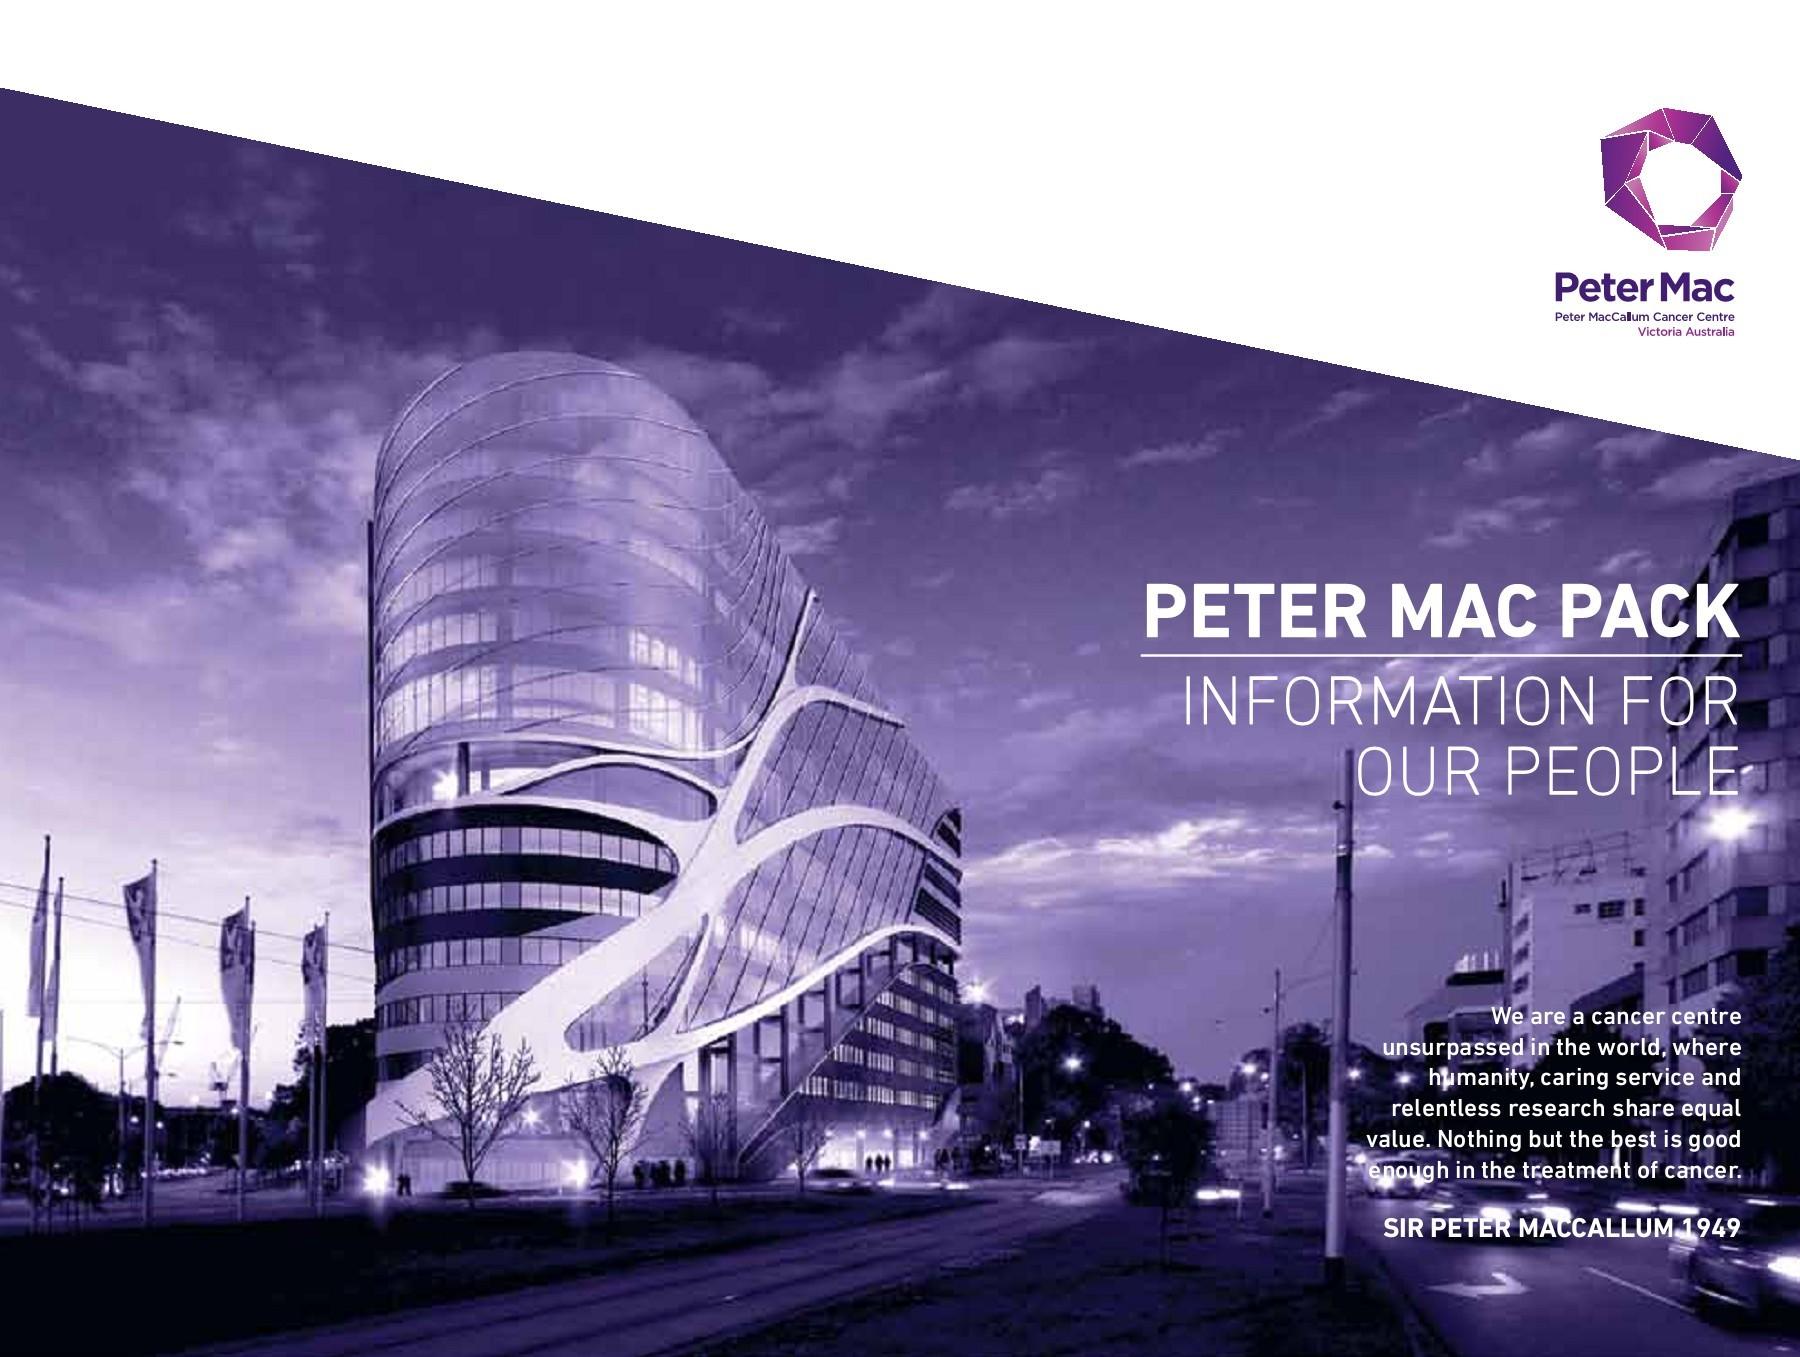 familial cancer clinic peter mac)